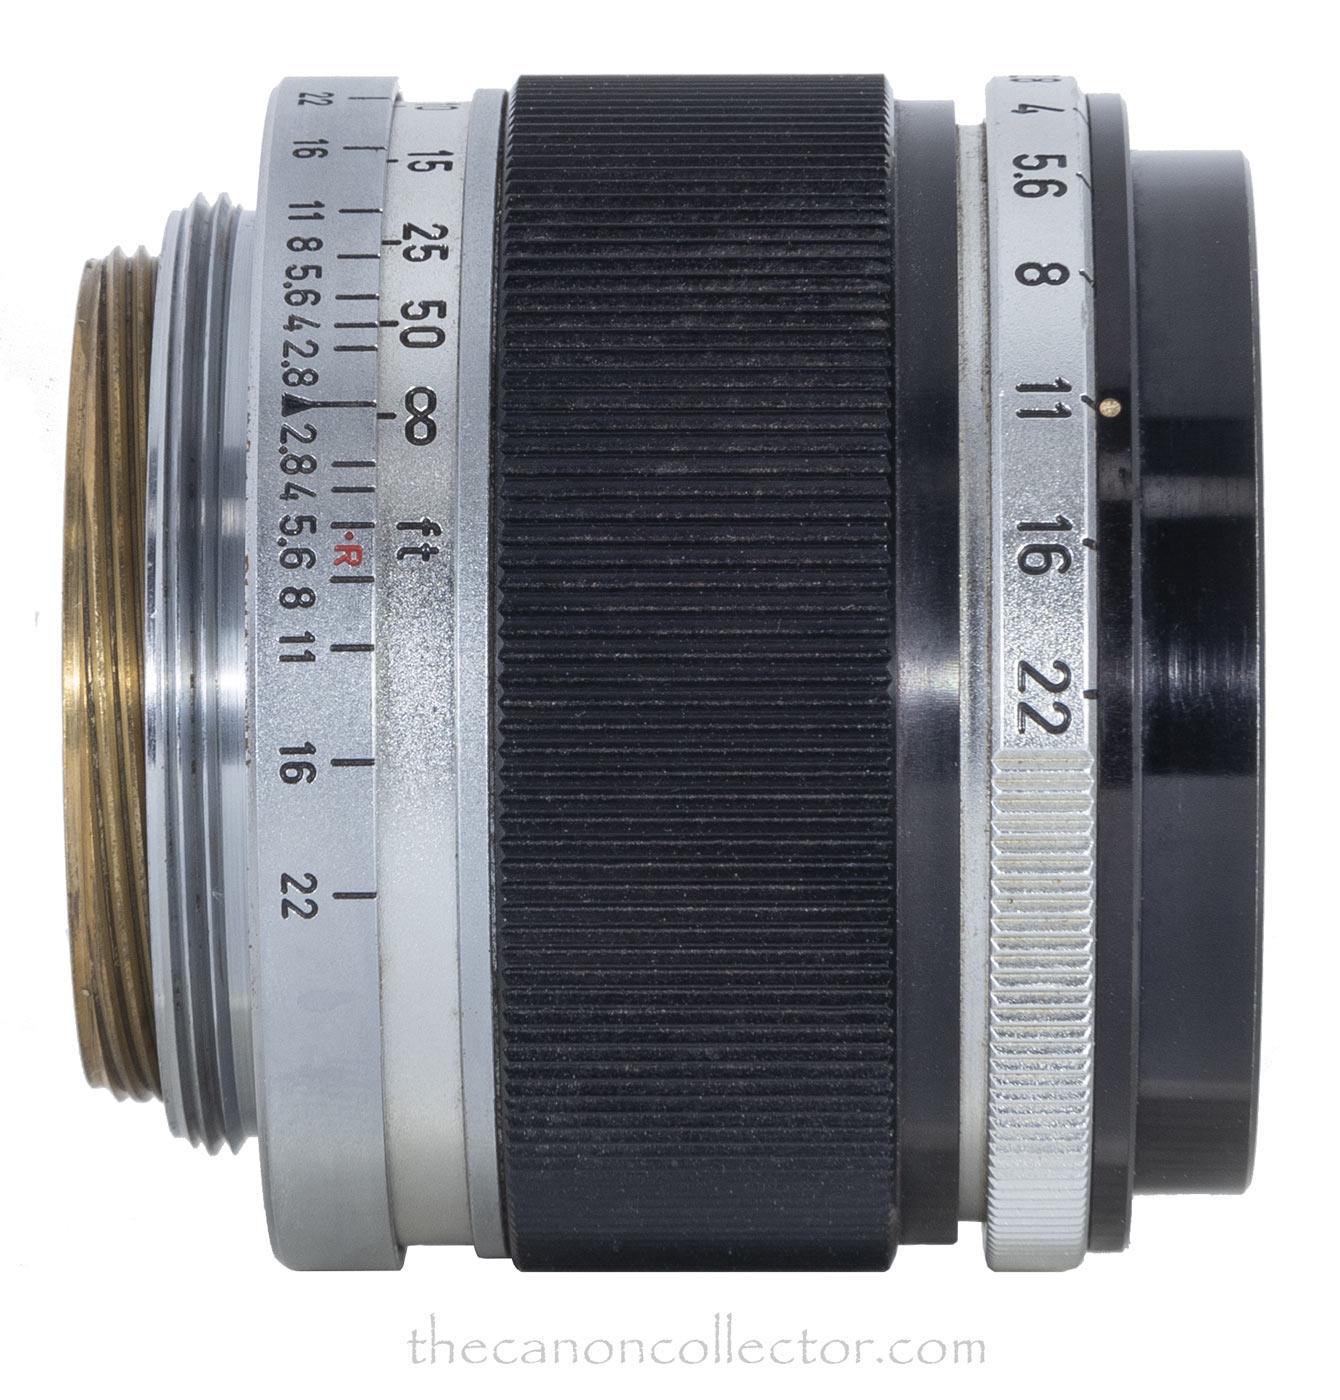 Canon S 50mm f/2.8 (II)